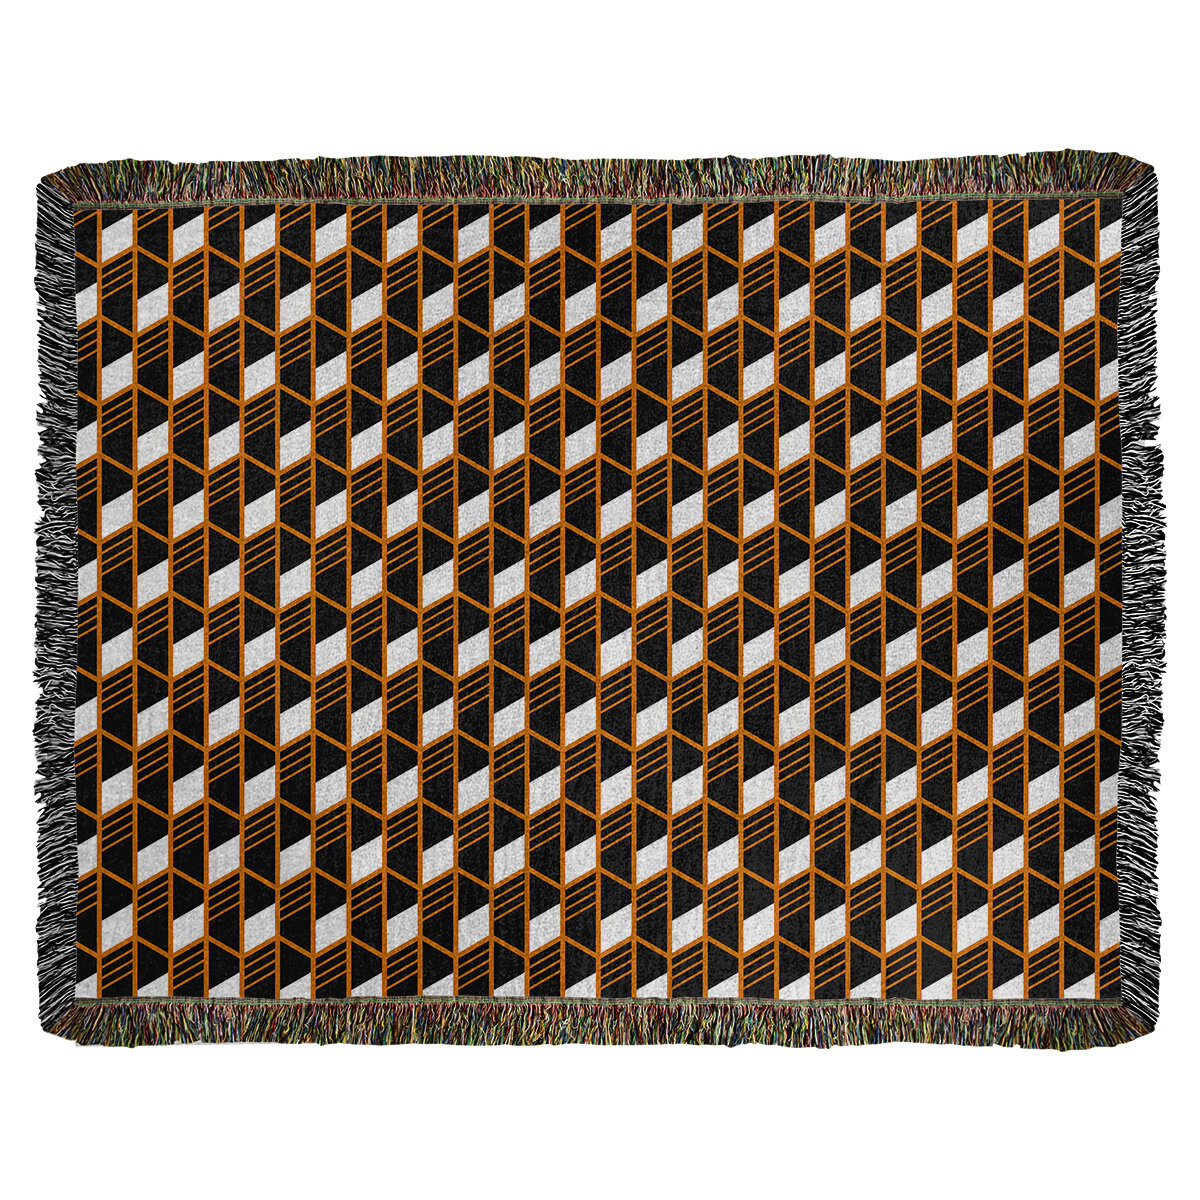 Ebern Designs Leffel Heavy Geometric Stripes Woven Cotton Blanket Wayfair